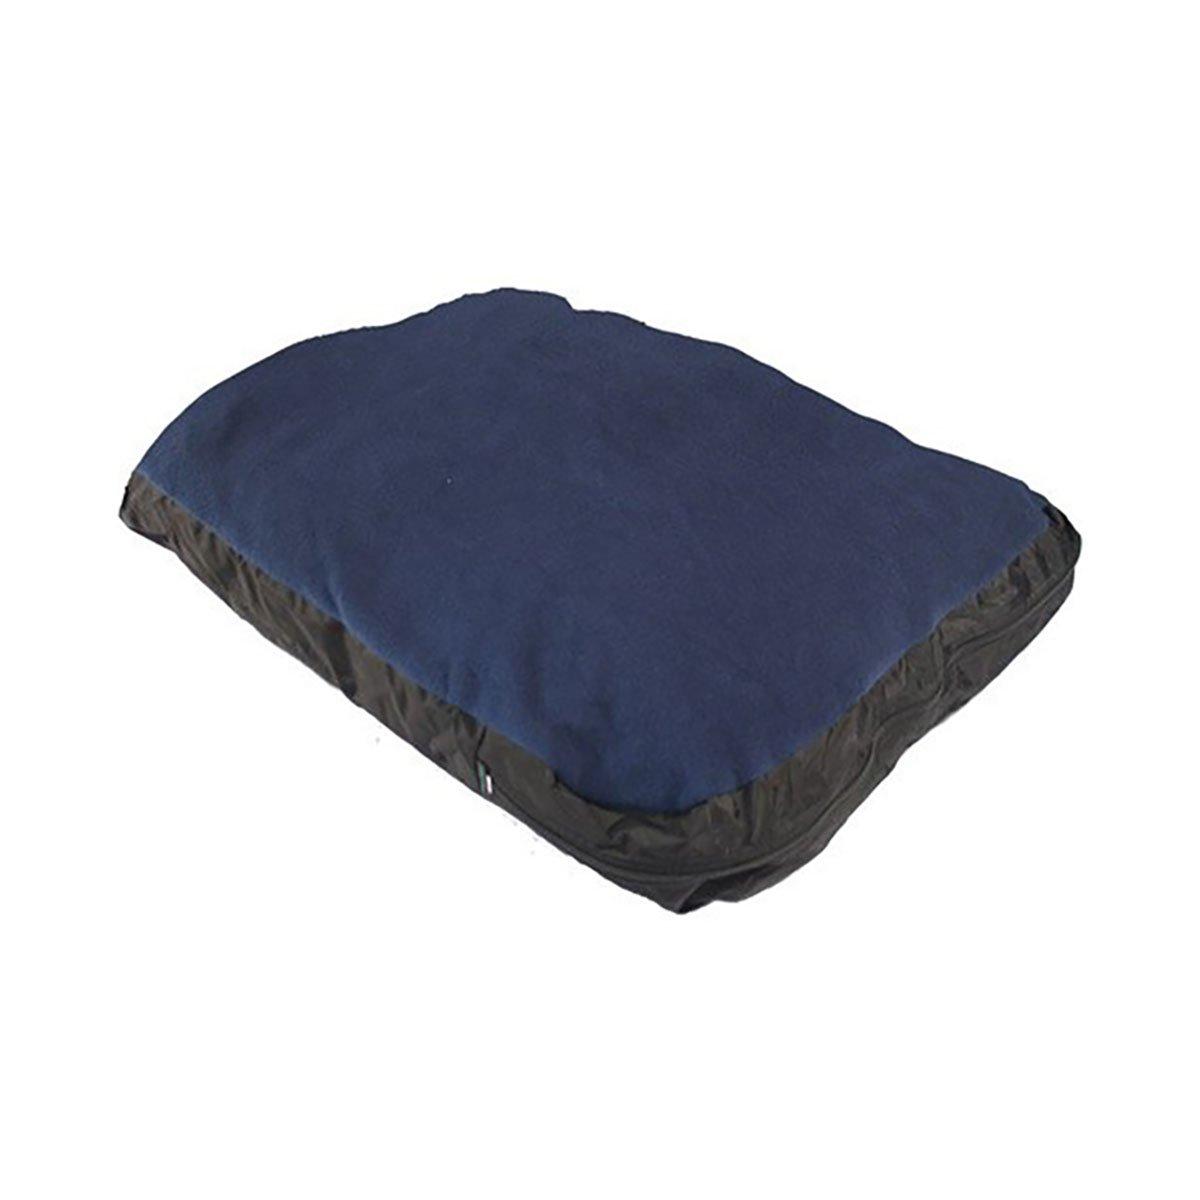 EQUINOX Medium Dog Bed 24 x 30